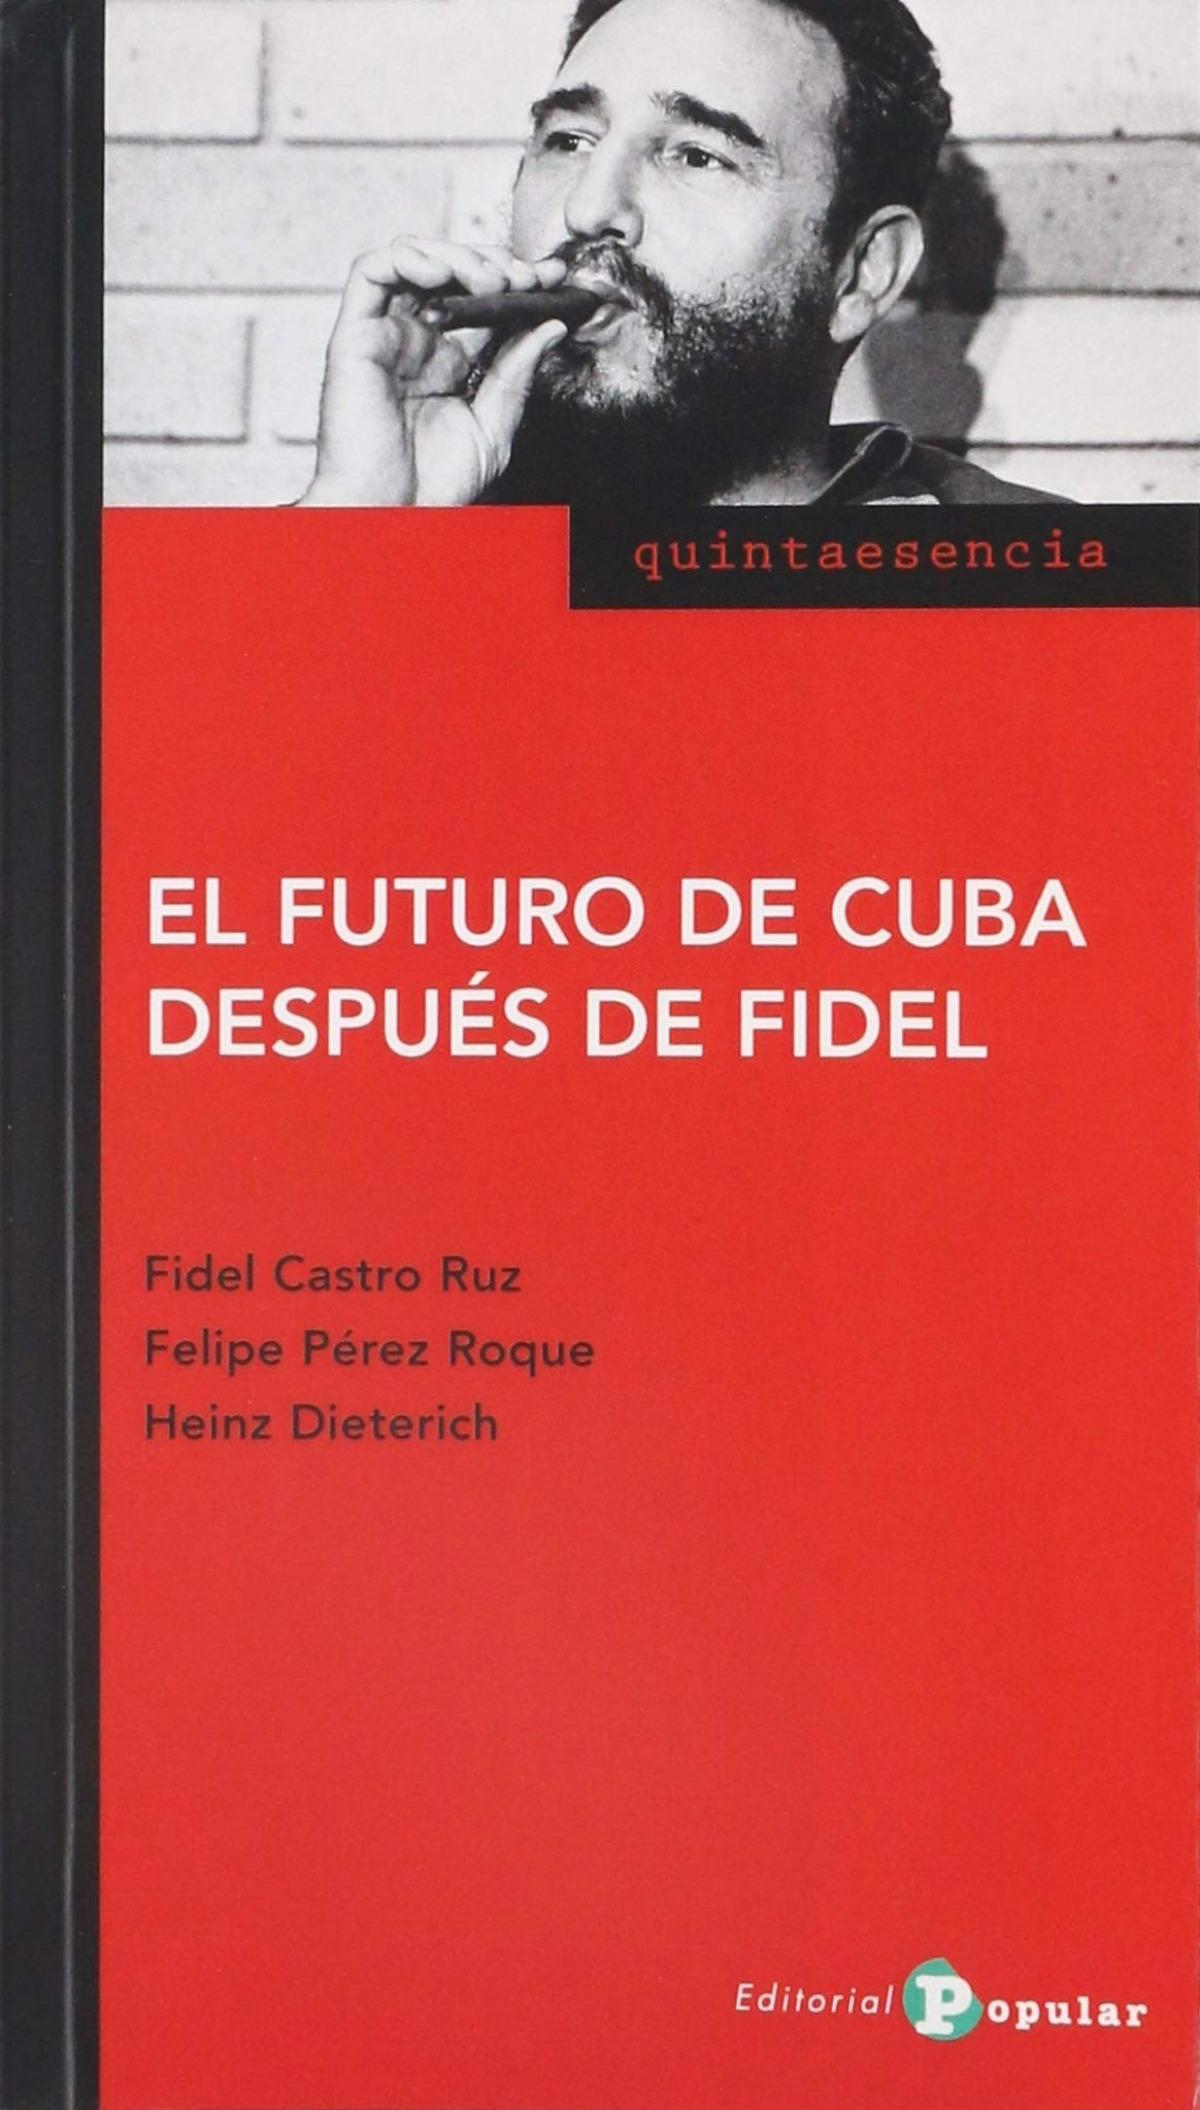 El futuro de Cuba después de Fidel 9788478847211